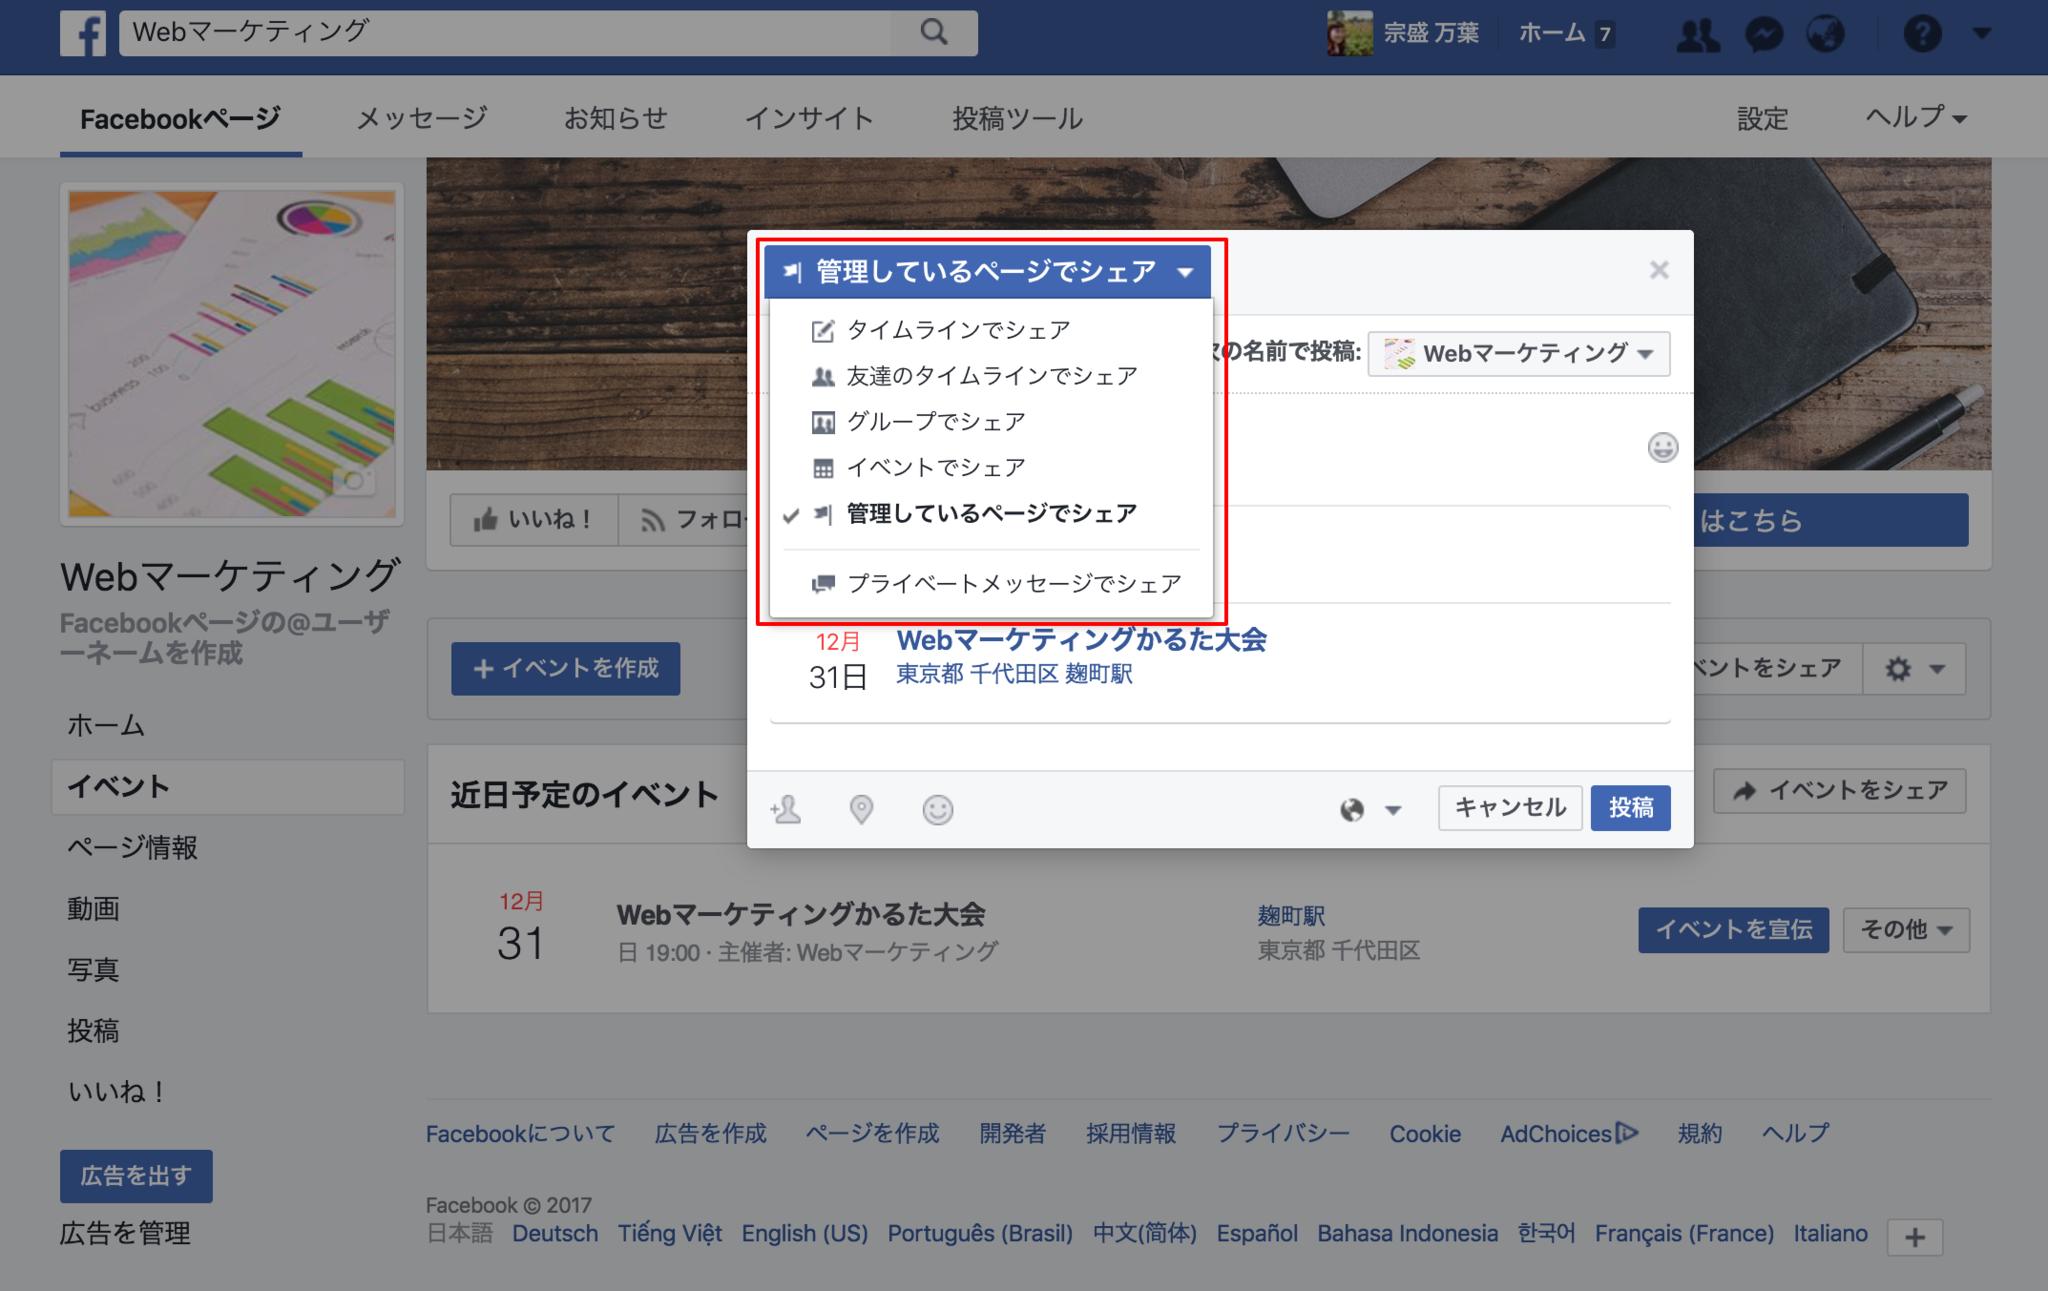 Webマーケティング___イベント_(3).png